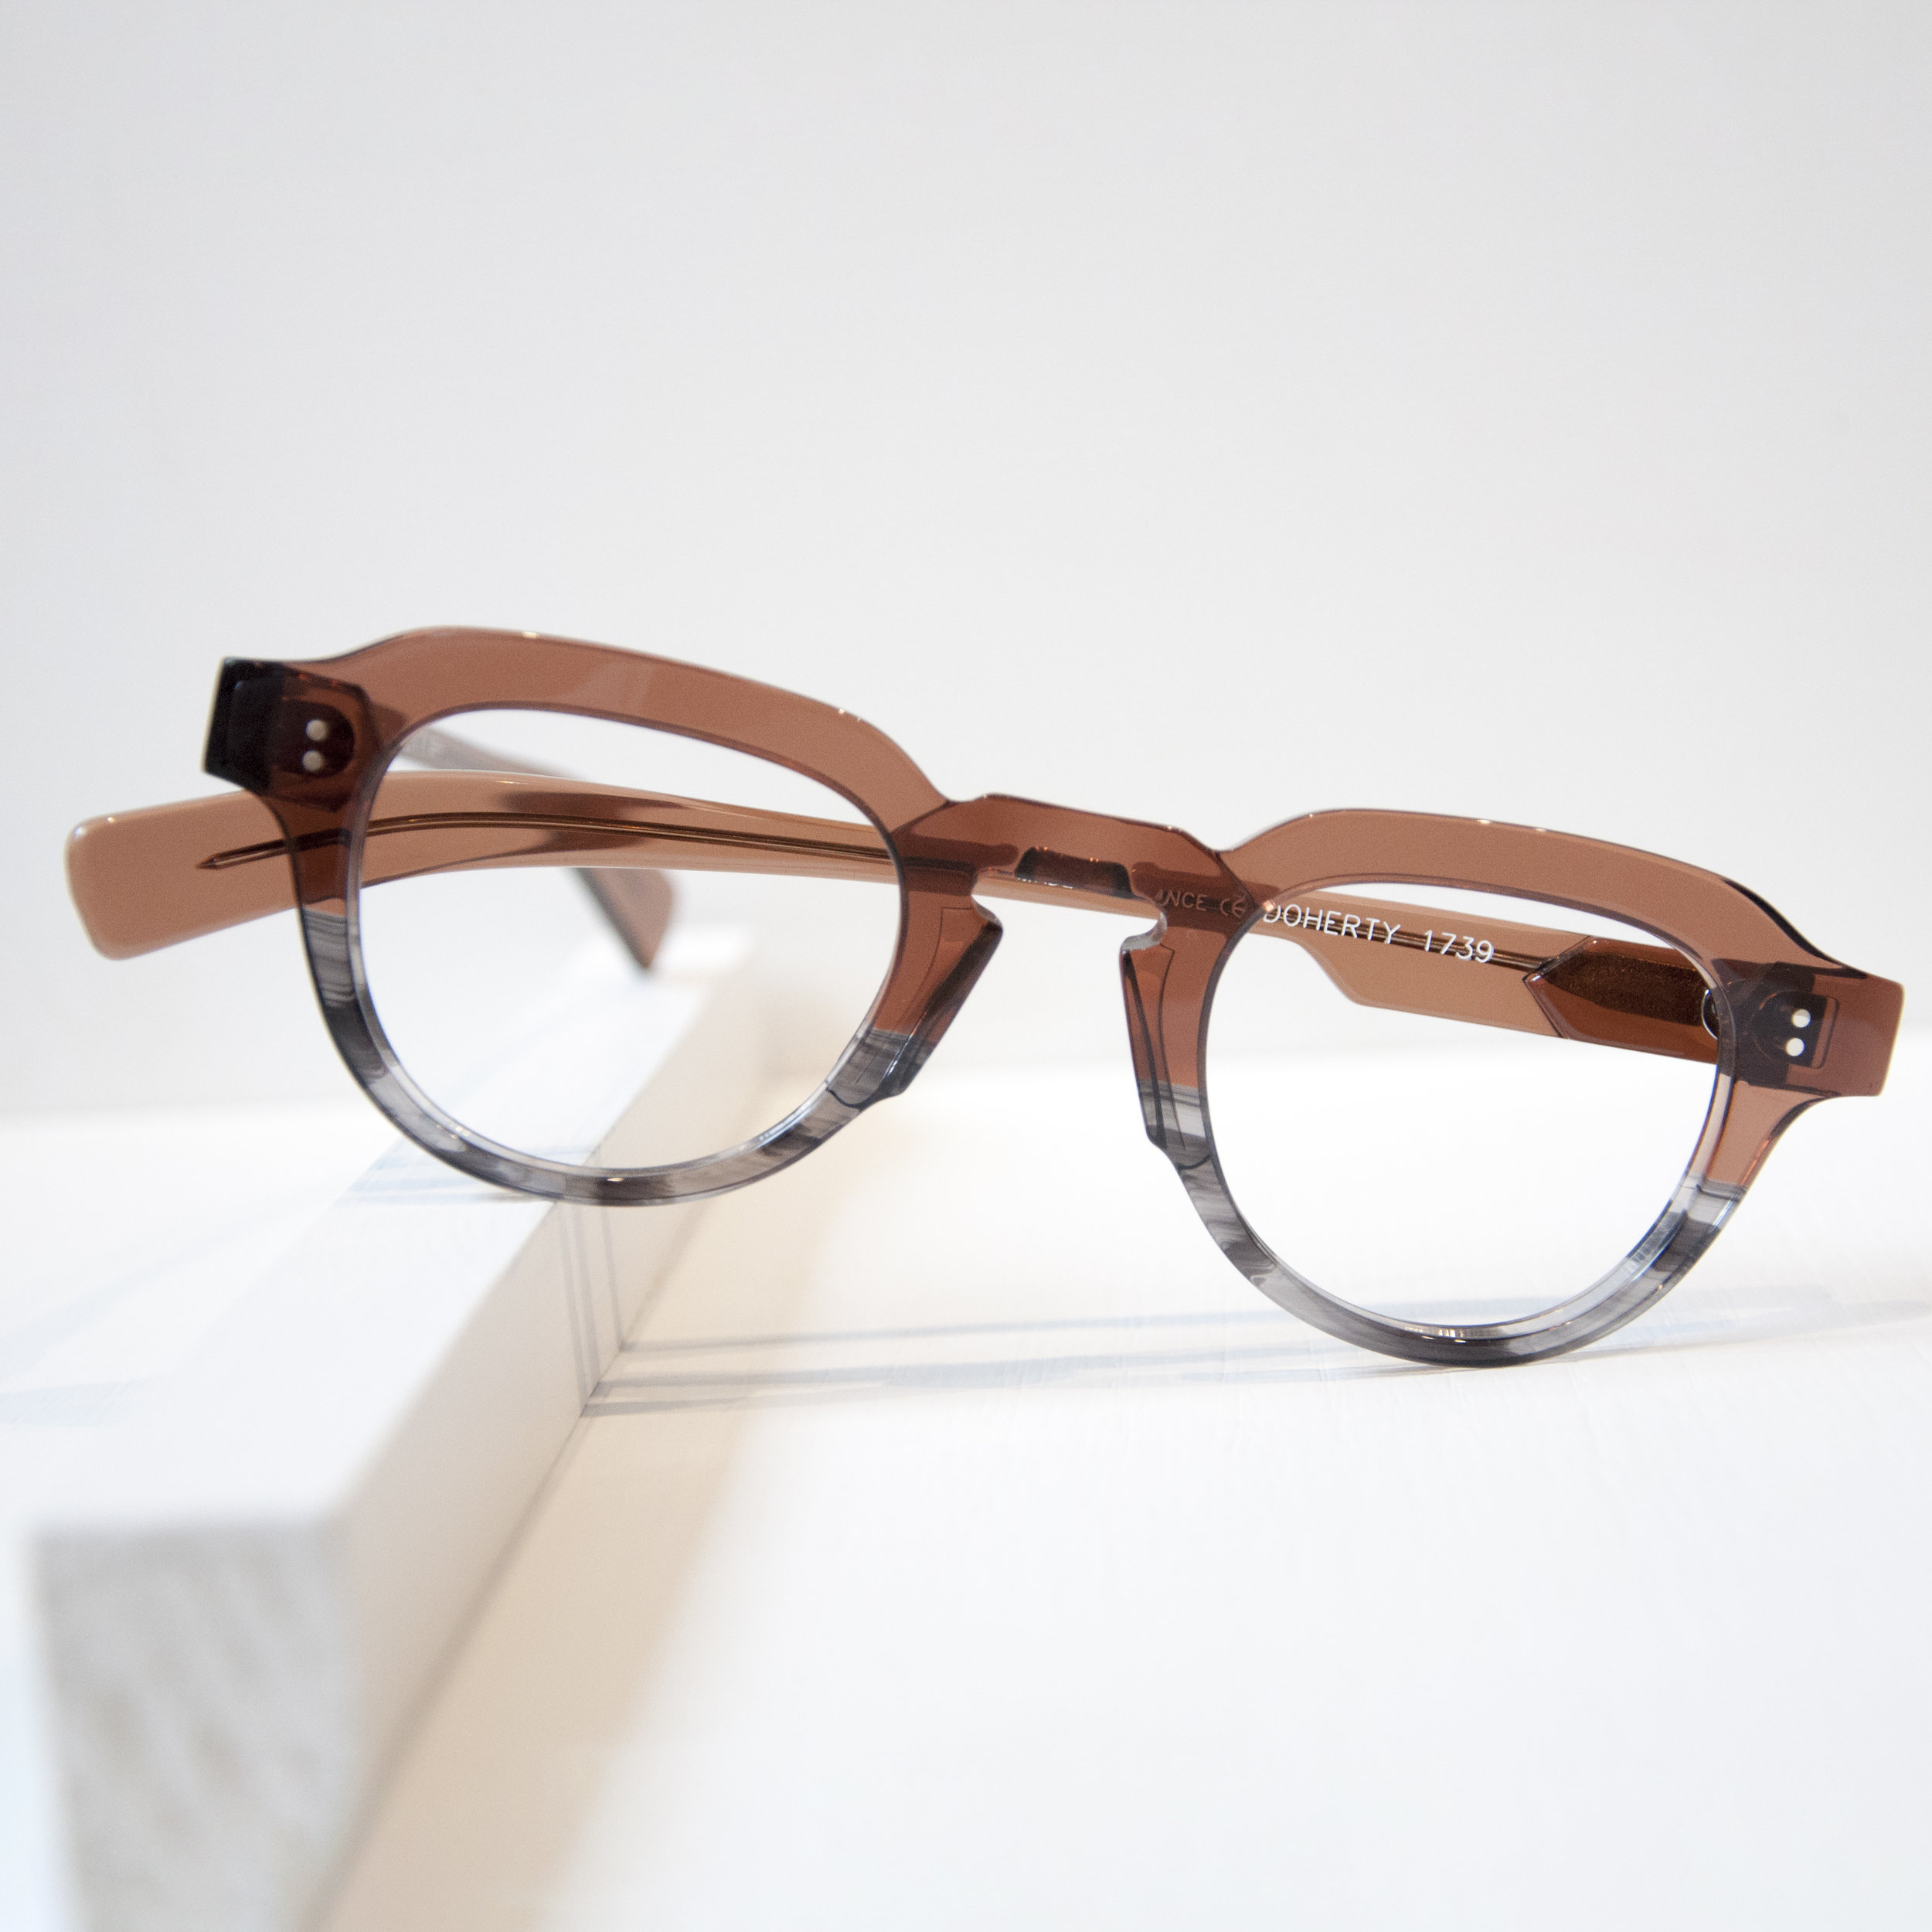 Atelier Mira Anne Amp Valentin French Made Eyeglasses